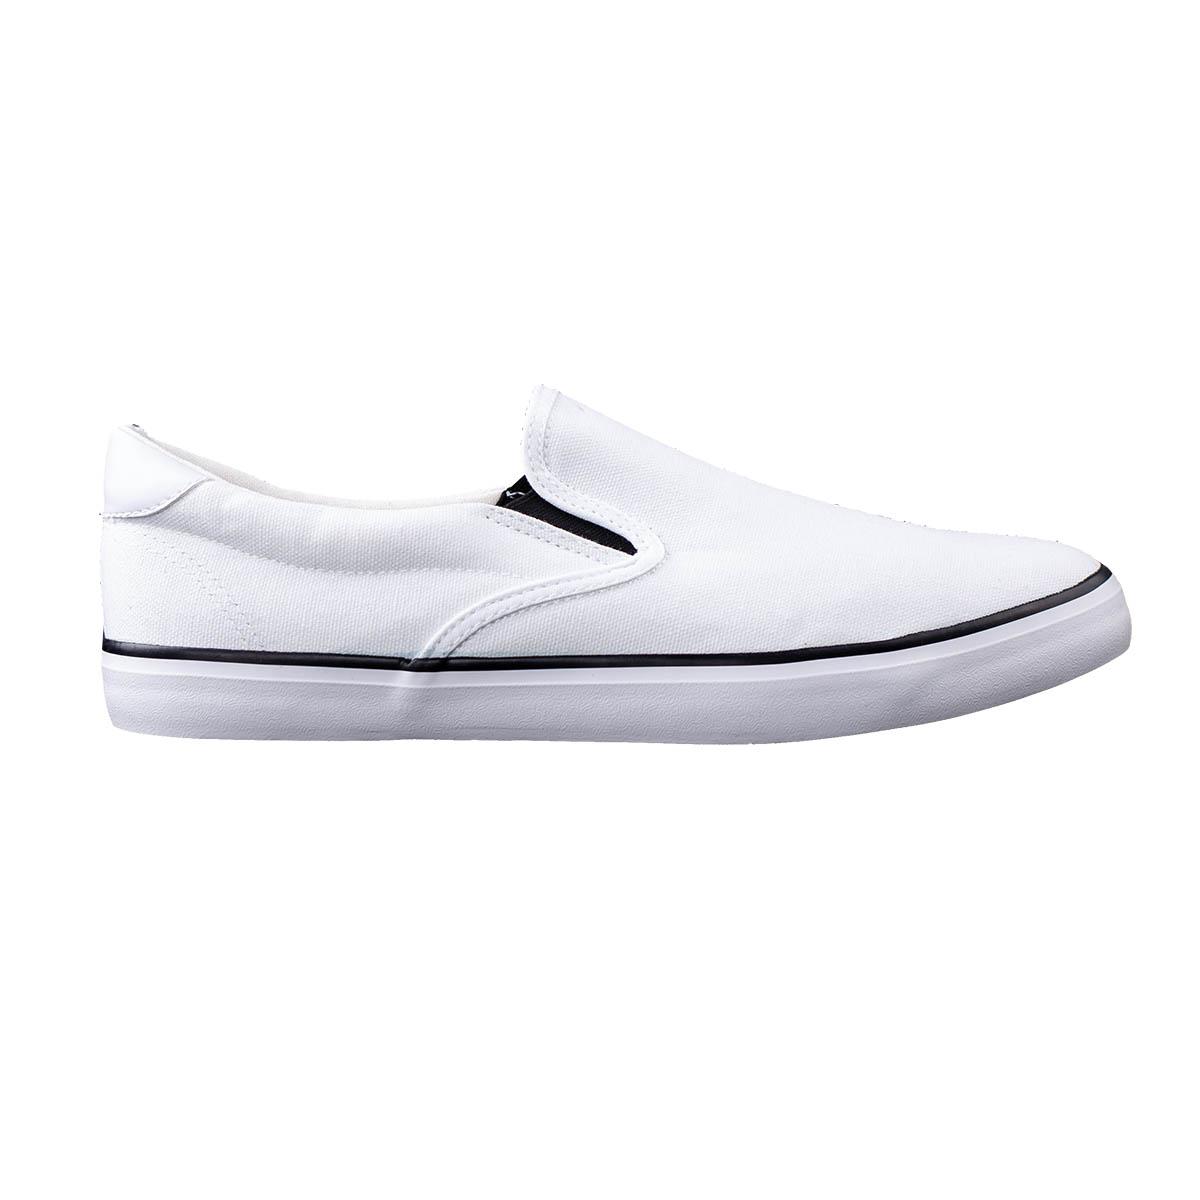 b273ff51734ed Ombre Clothing Pánske slip on topánky Vulf biele - Glami.sk